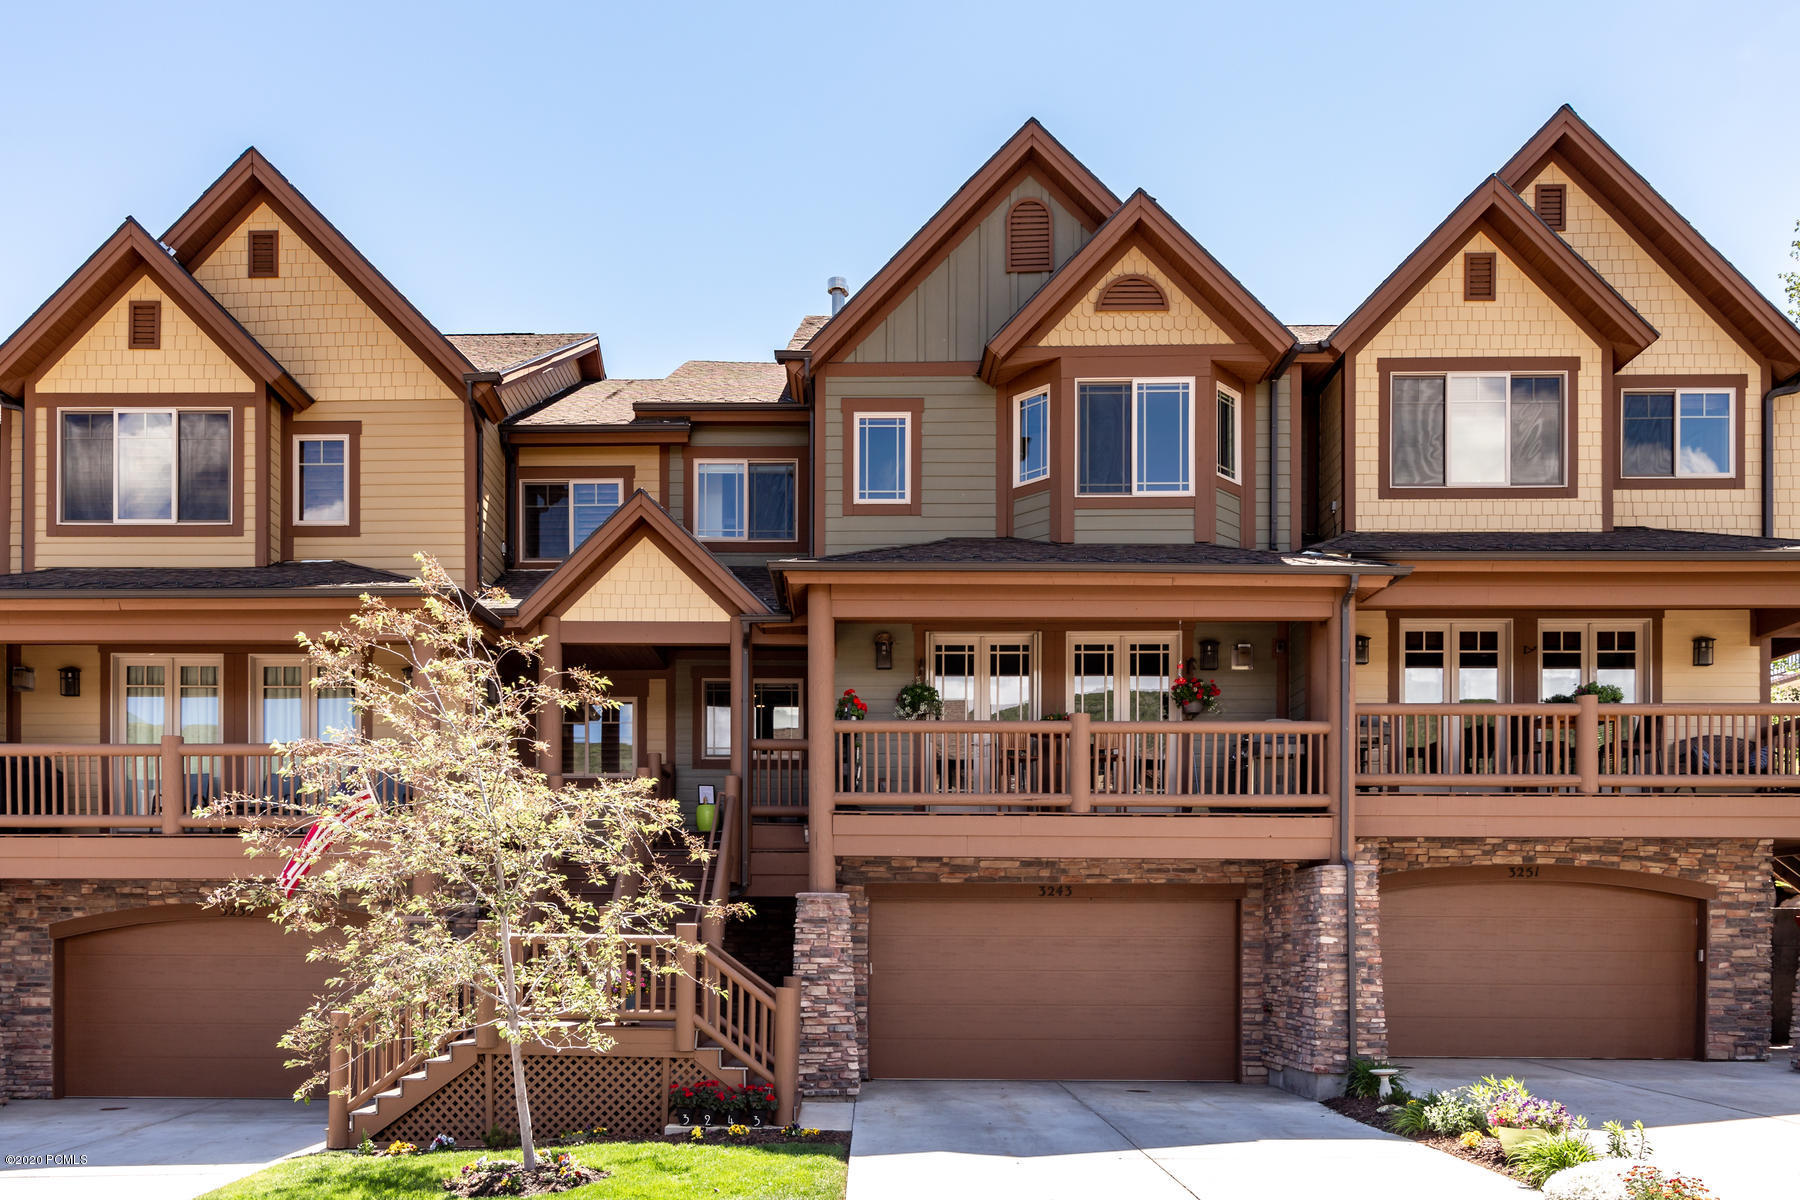 3243 Lower Saddleback Road, Park City, Utah 84098, 3 Bedrooms Bedrooms, ,4 BathroomsBathrooms,Condominium,For Sale,Lower Saddleback,20190109112430415765000000